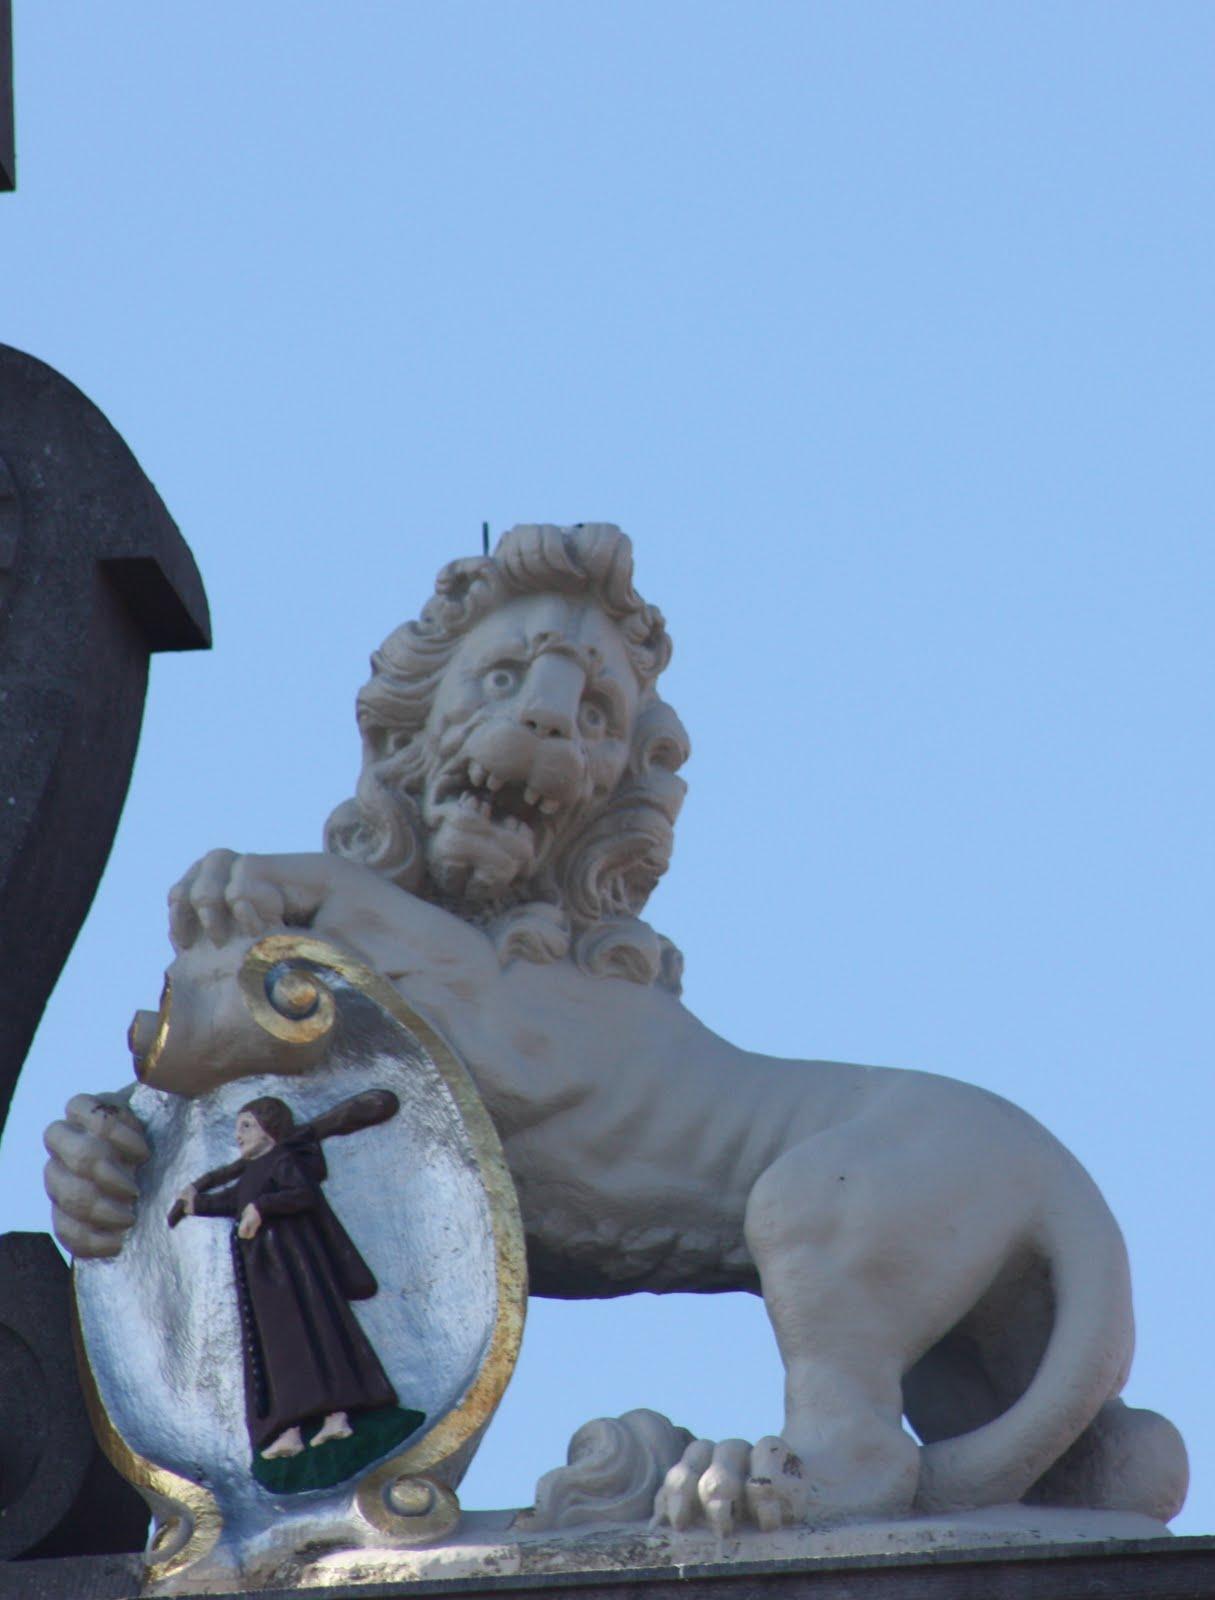 An Unfittie S Guide To Adventurous Travel It S Lion Time